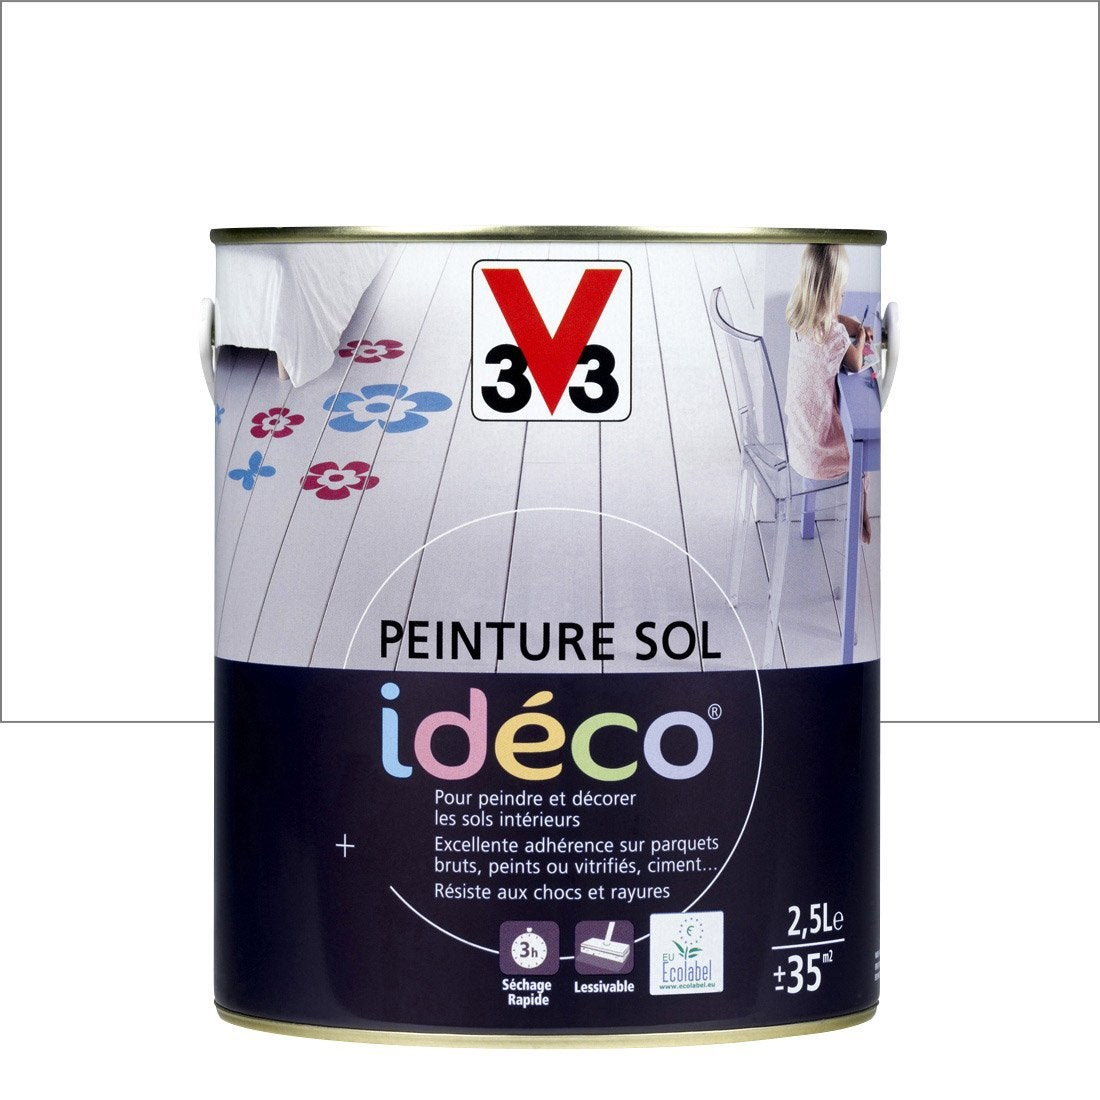 Peinture sol int rieur d co v33 blanc 2 5l leroy merlin - Peinture sol ideco v33 ...